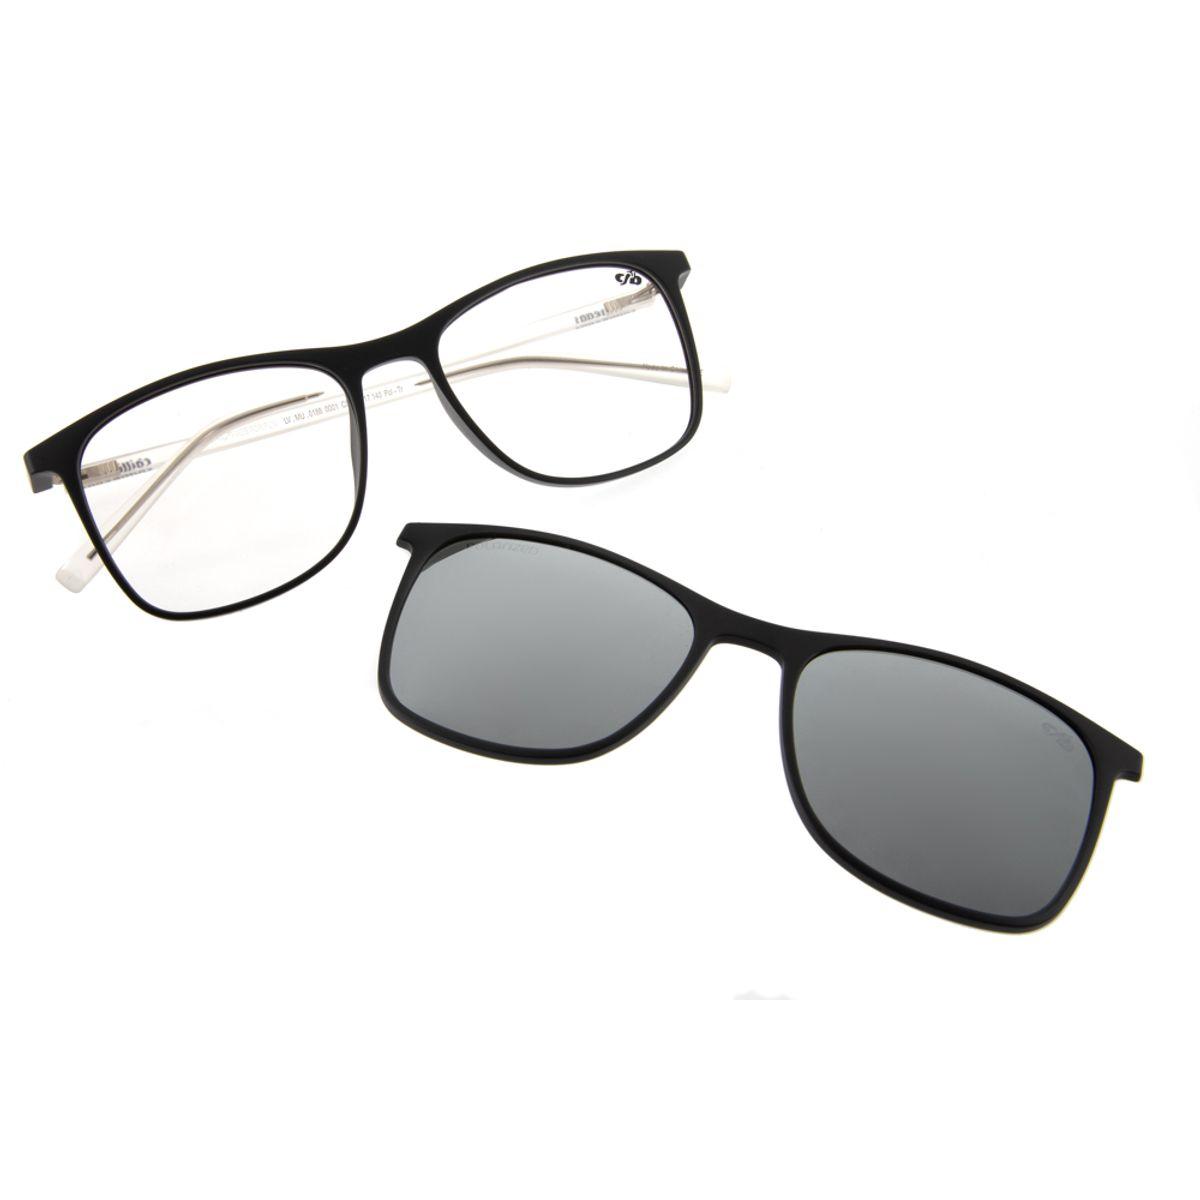 bc24d4ad0 Previous. armacao para oculos de grau chilli beans bicolor clip on preto  0186 0001; armacao para ...